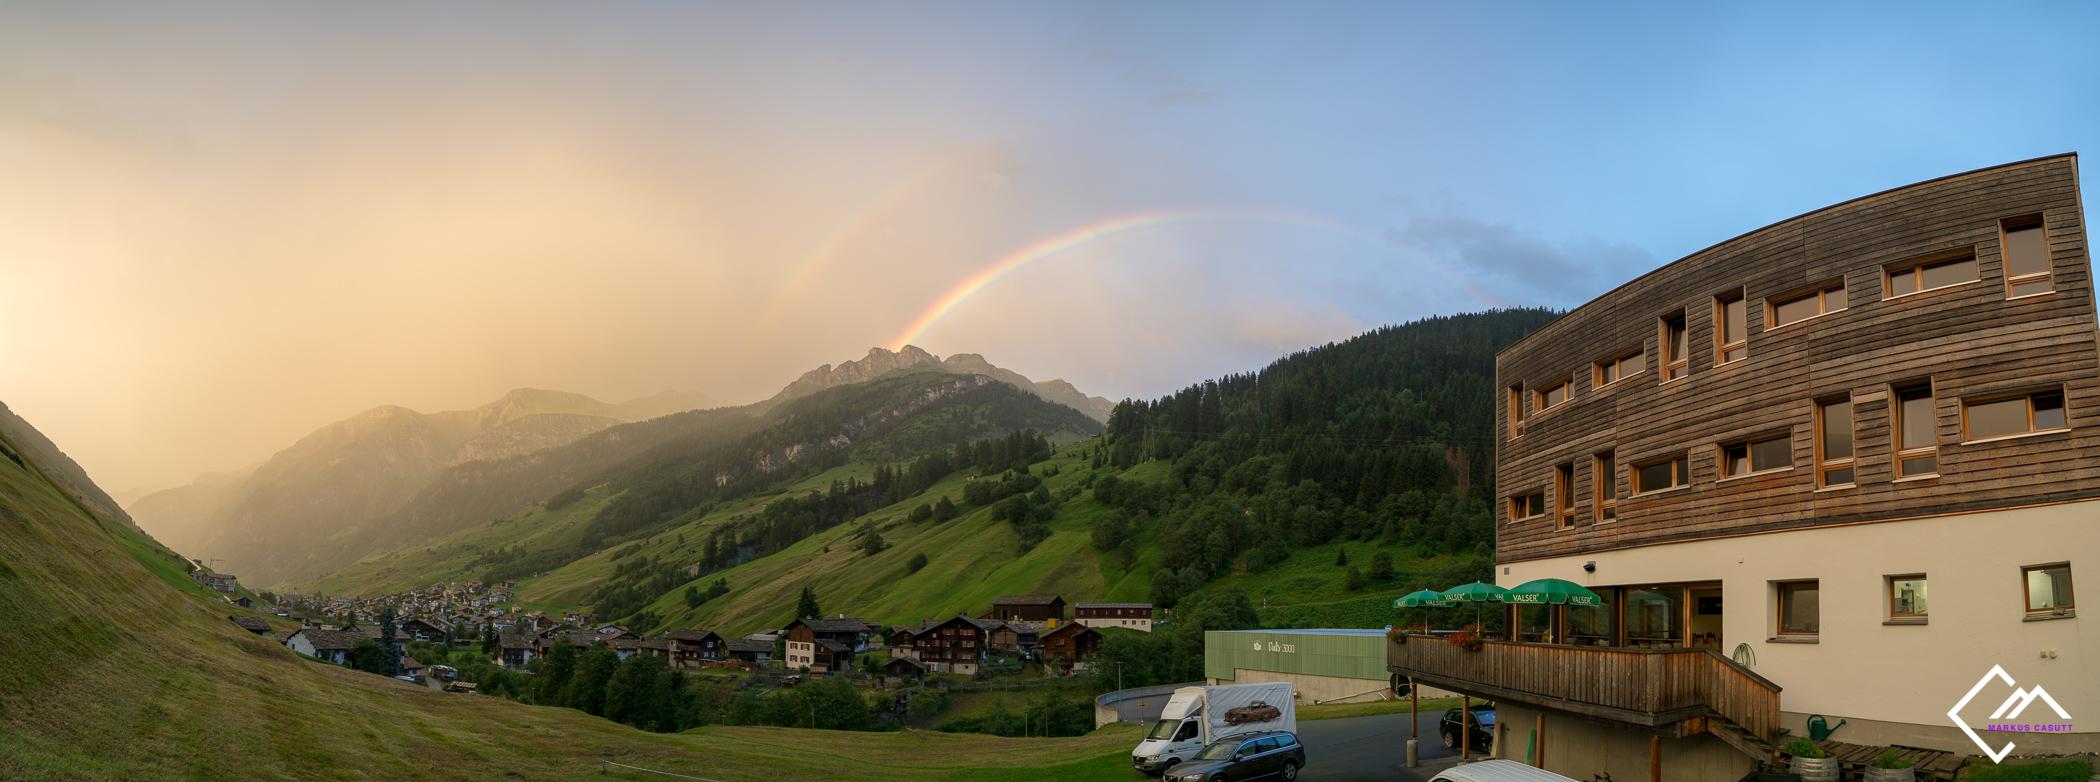 RegenbogenHoereli_a7rii_170705_00023-Pan